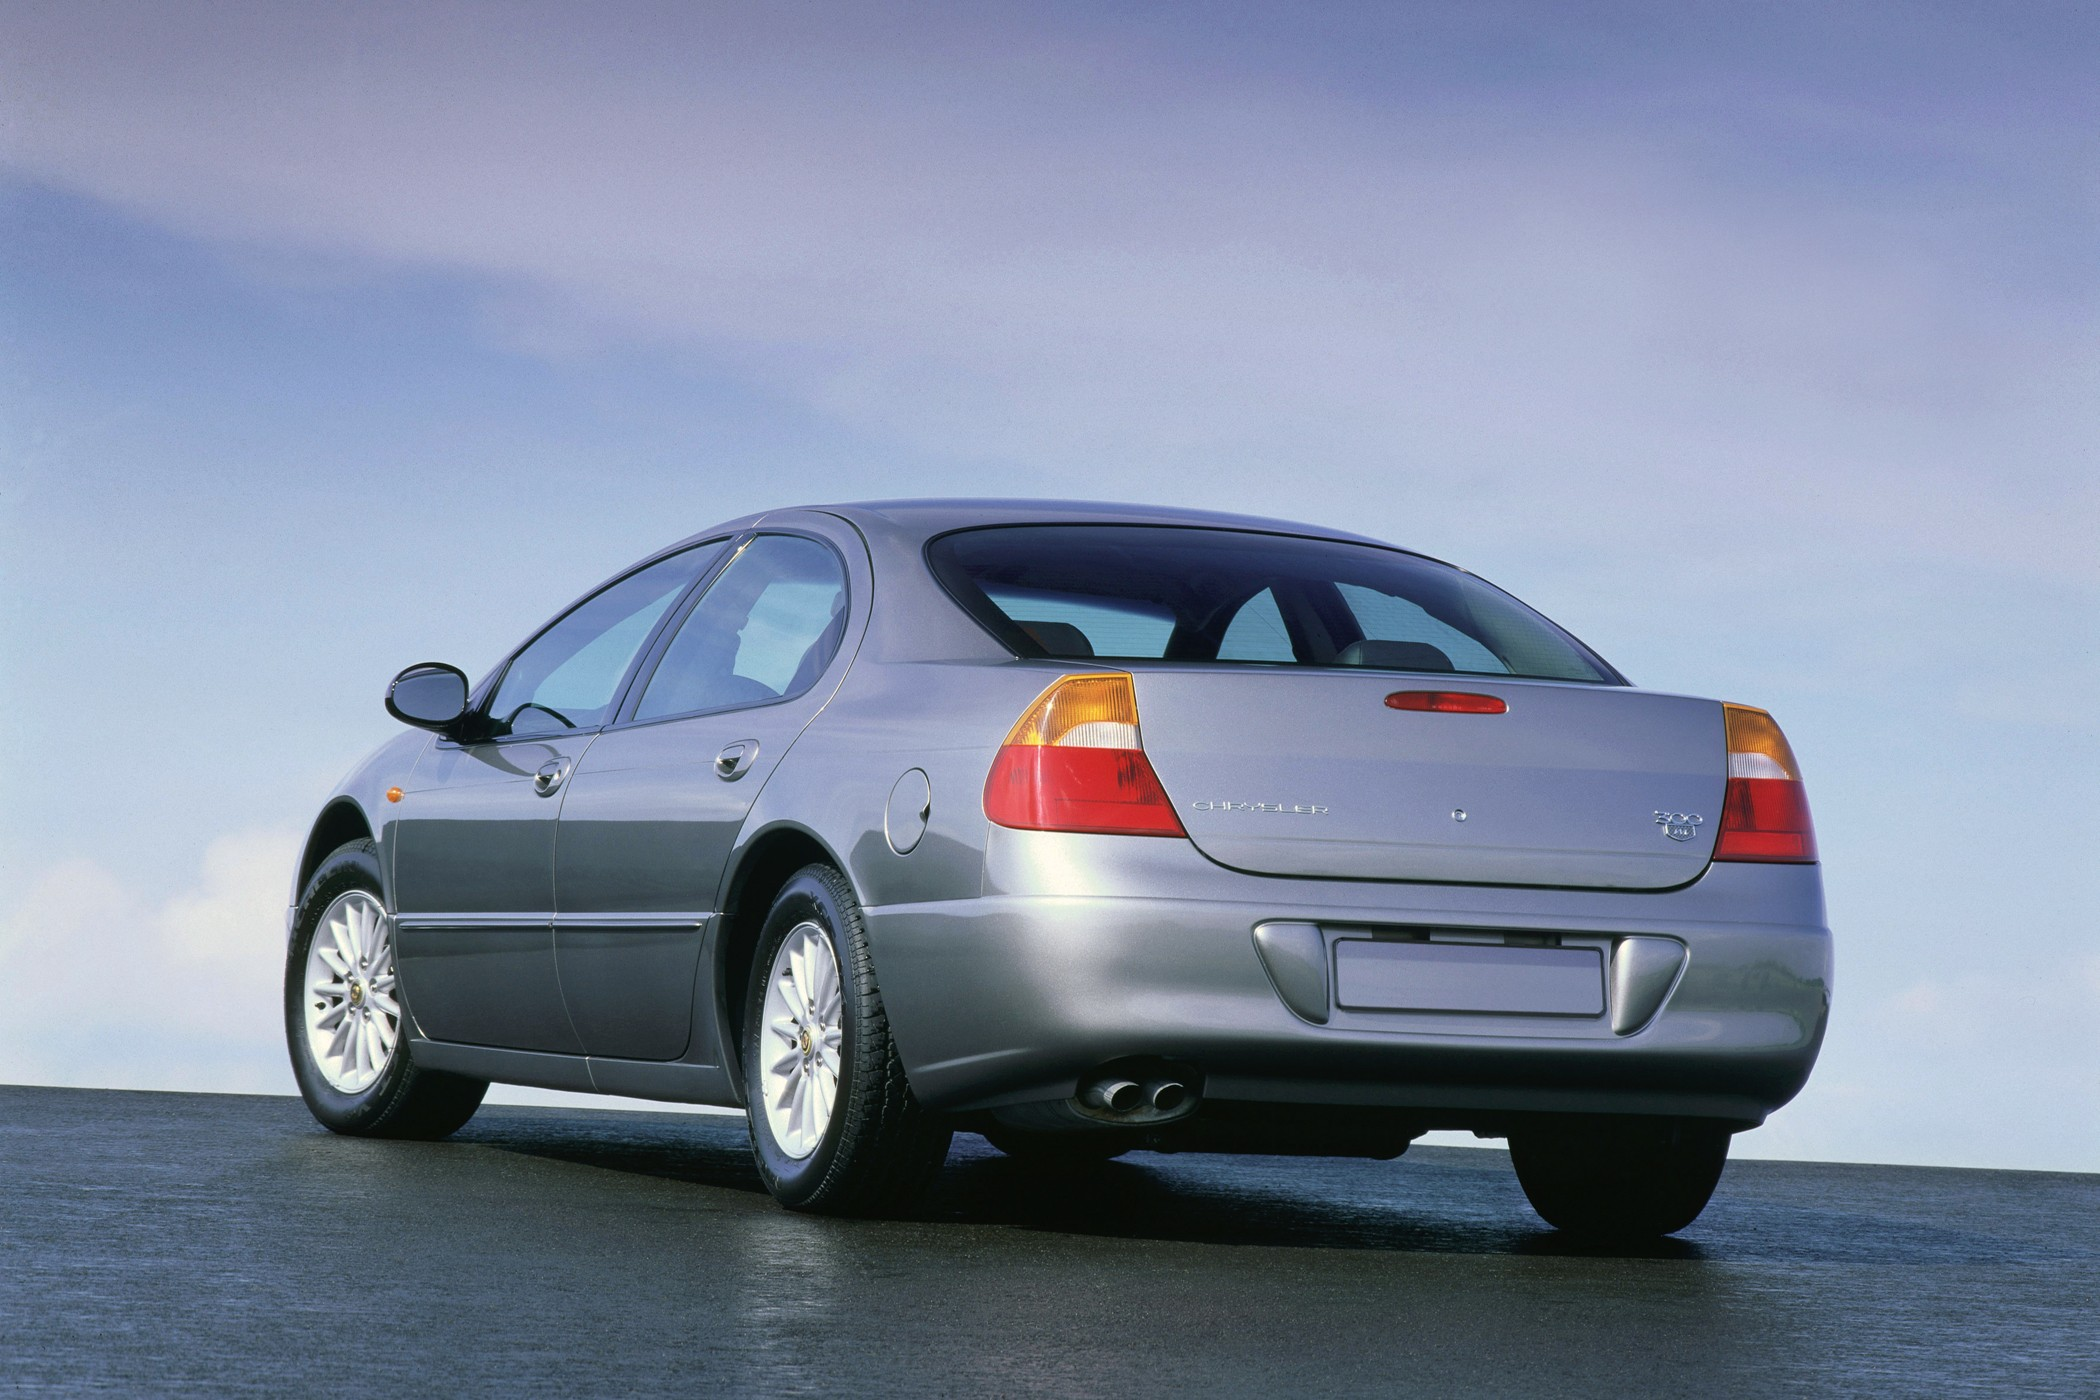 chrysler 300m 2003 1998 2004 cars 2000 autoevolution 1999 2002 2001 specs